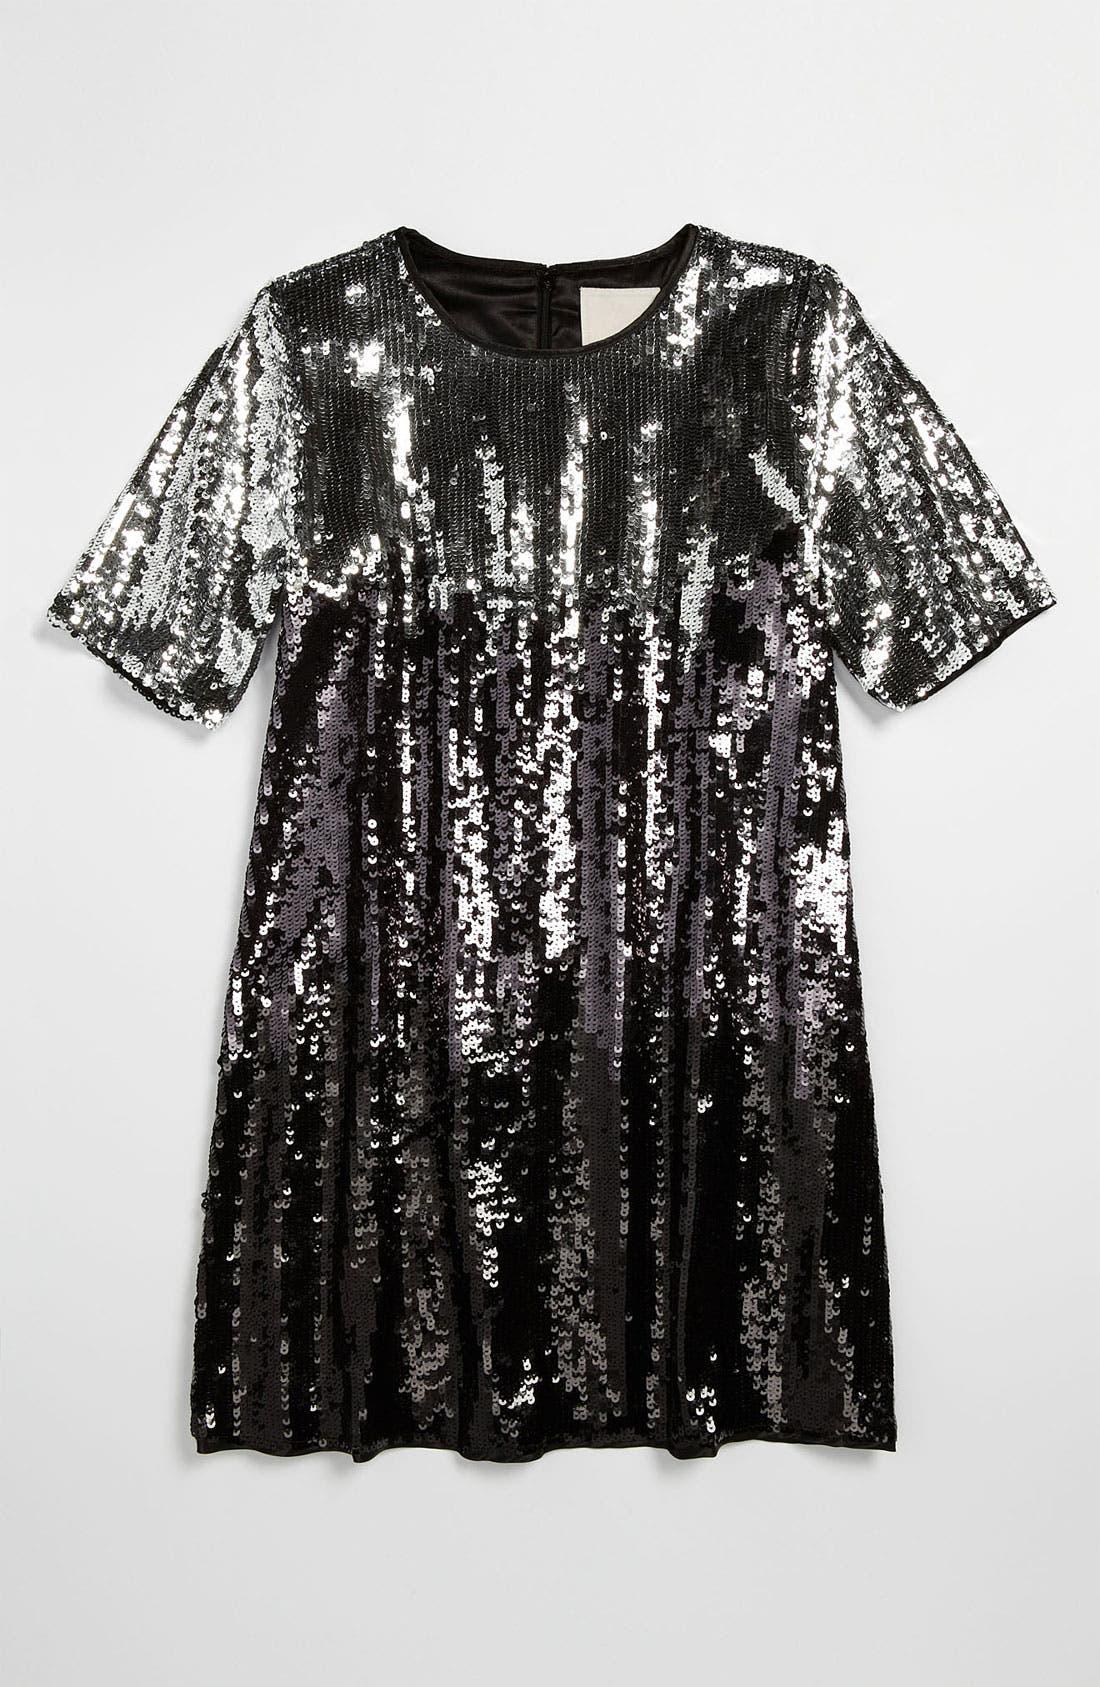 Main Image - La Piccola Danza Kidswear Sequin Ombré Dress (Little Girls & Big Girls)